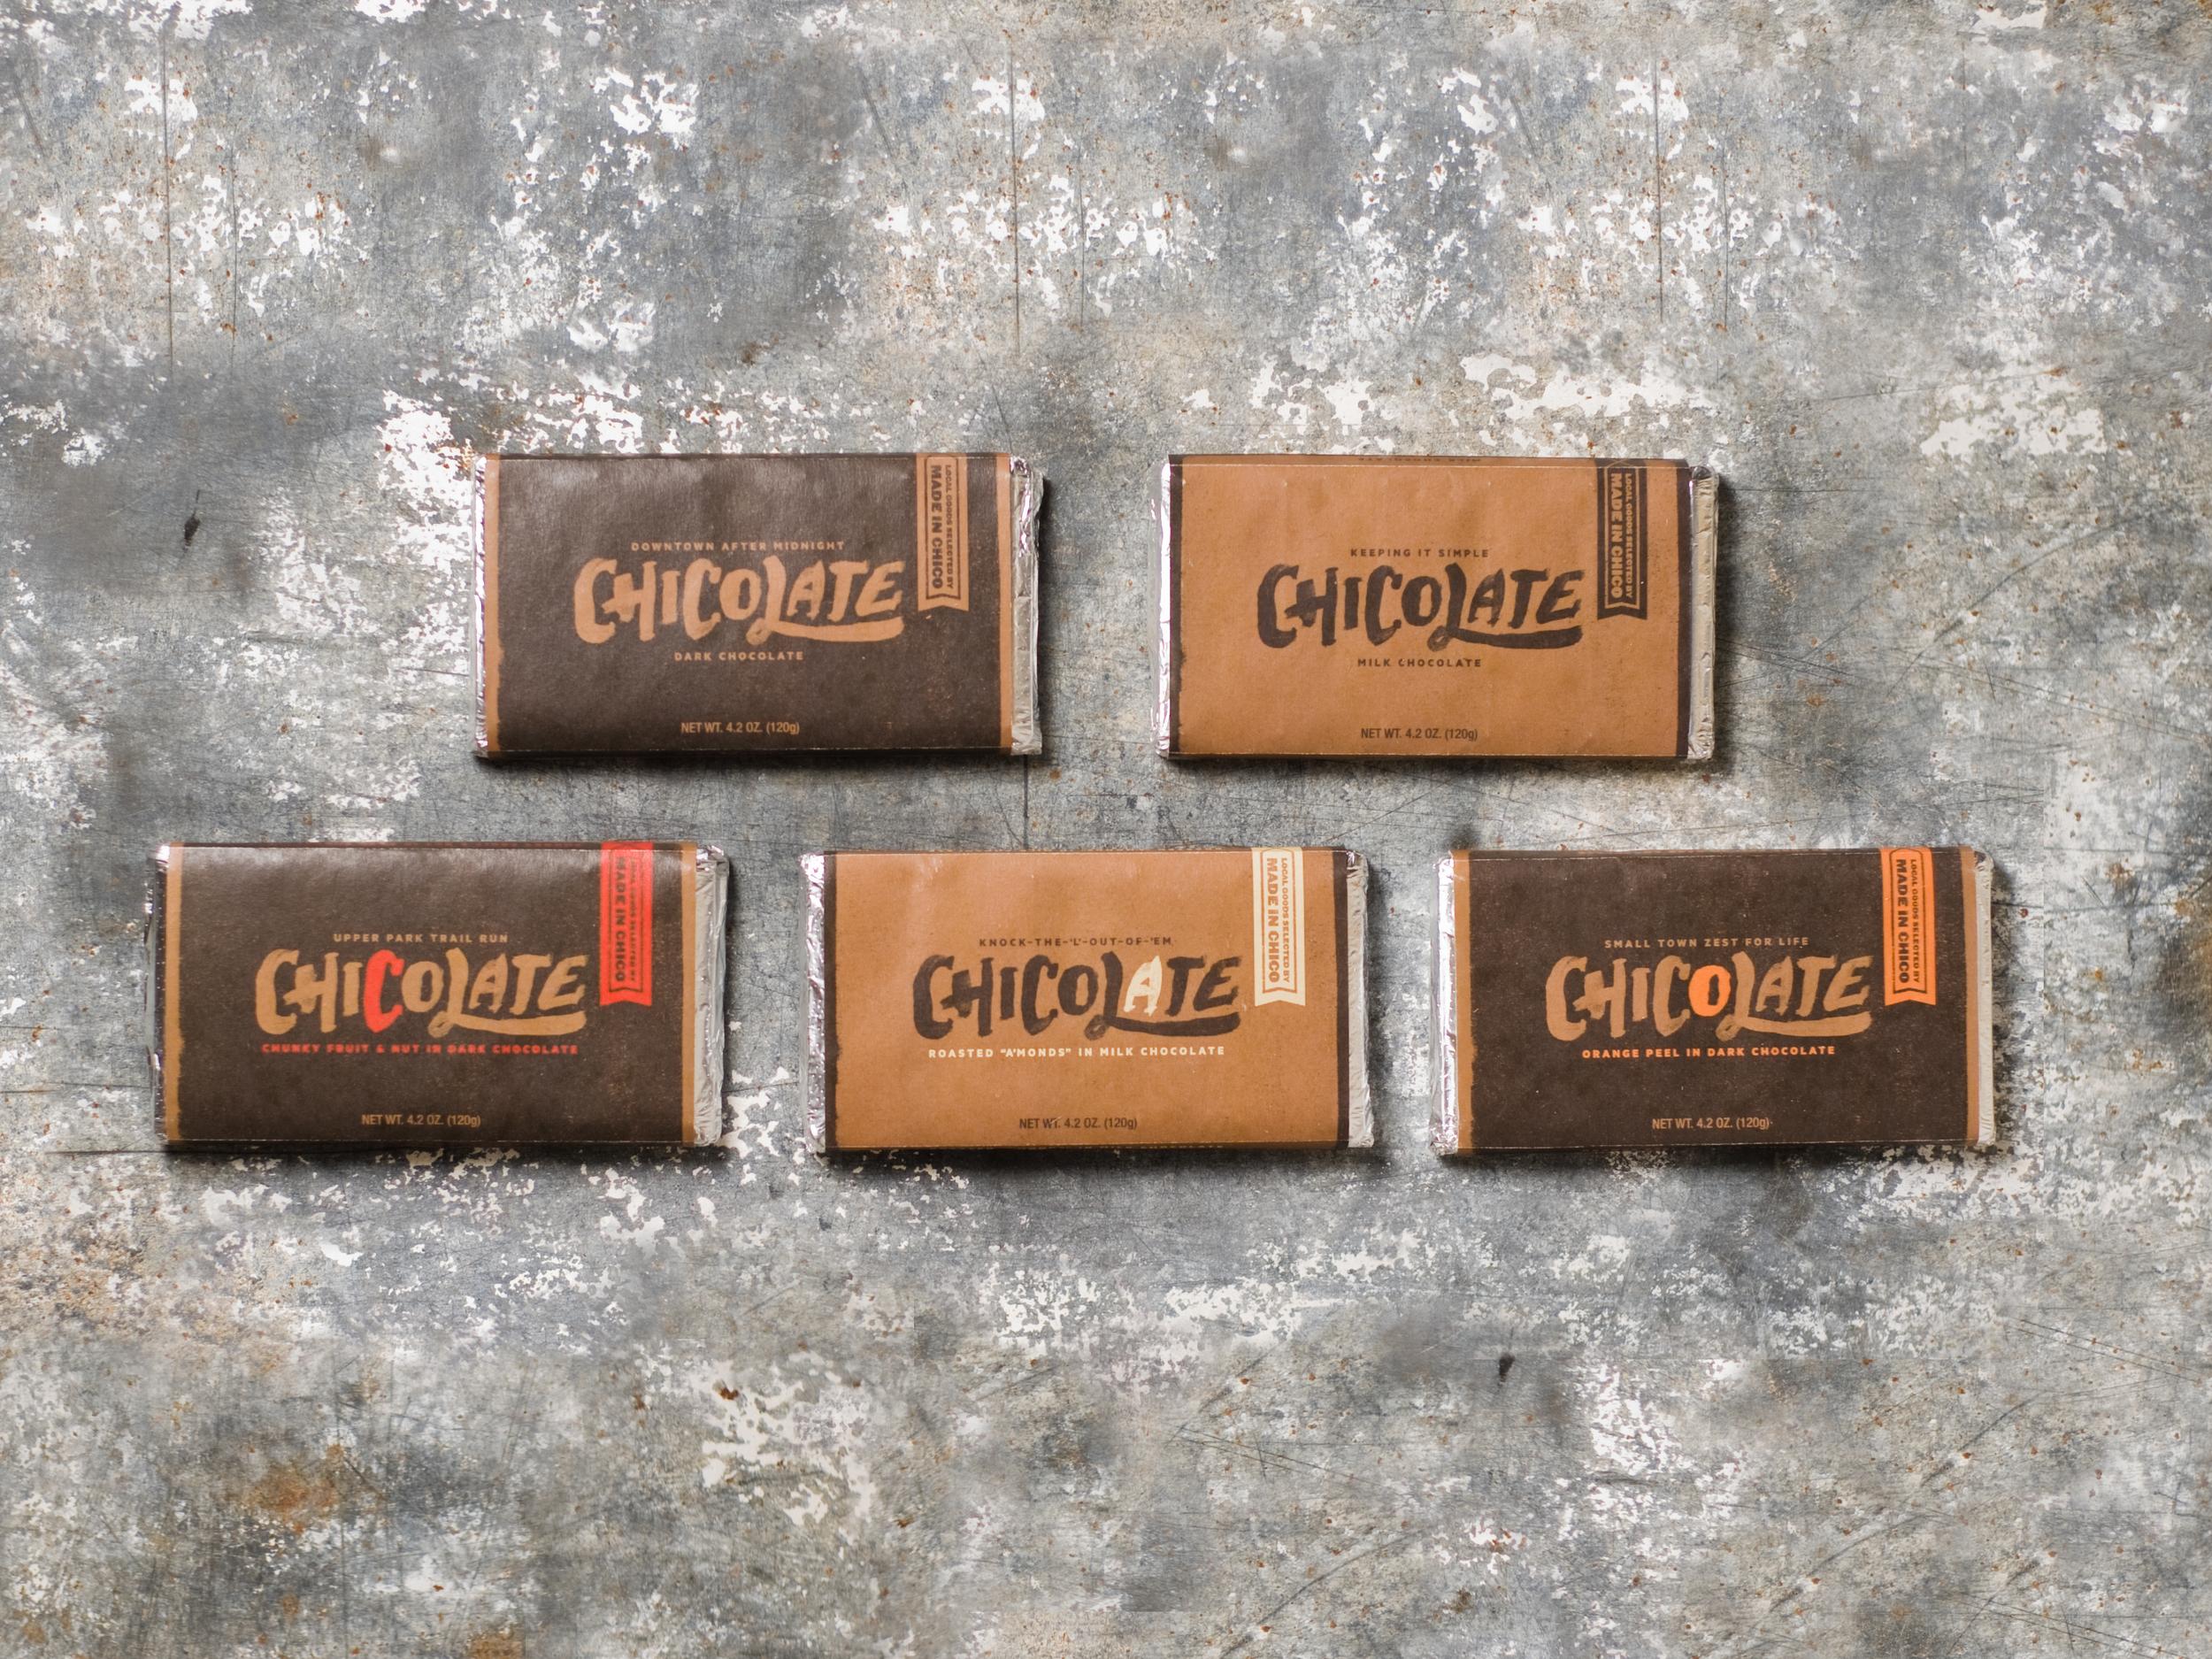 Chicolate_Bars